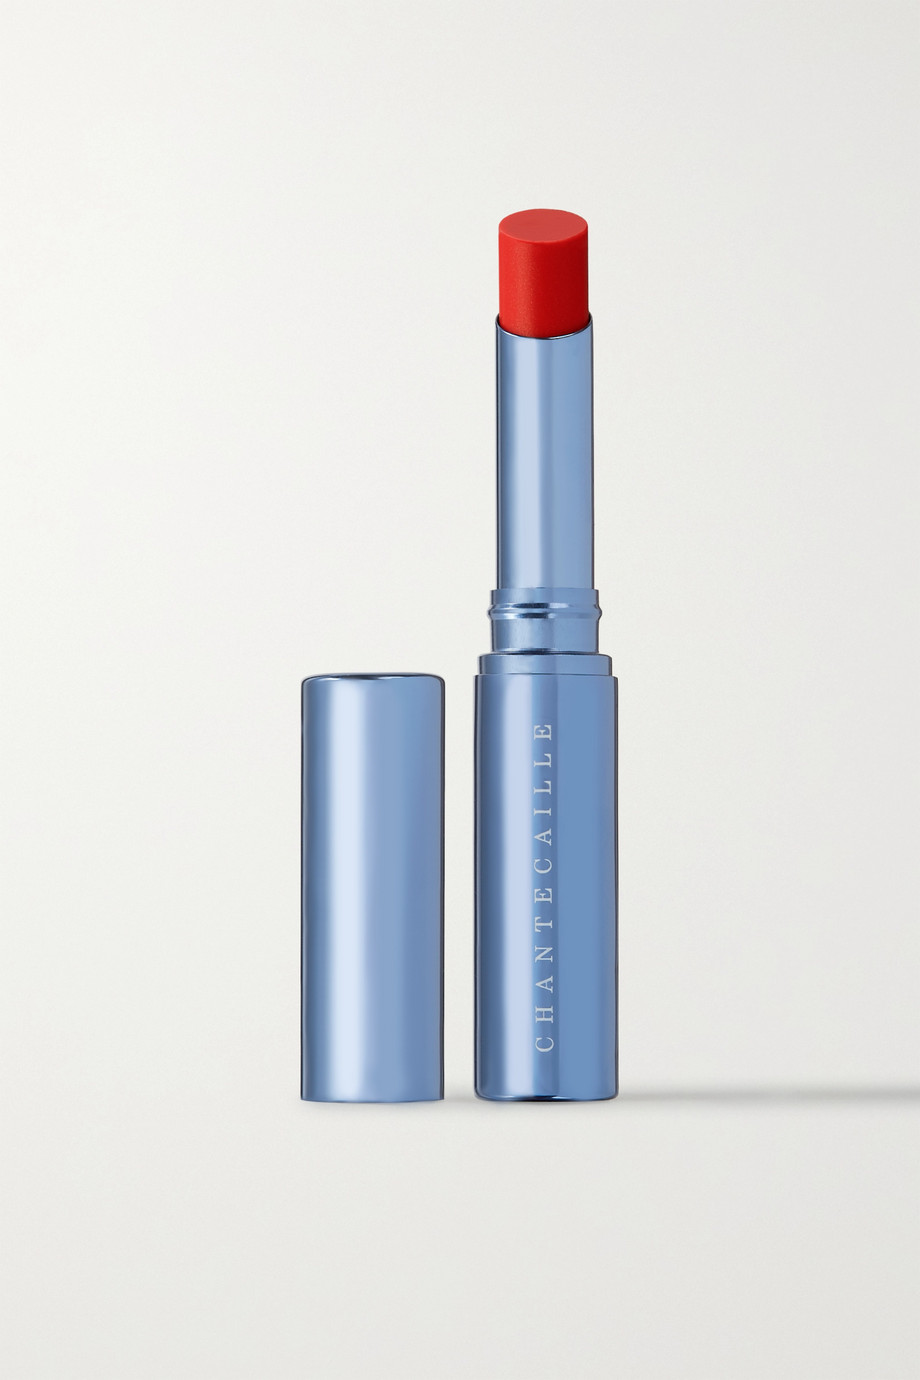 Chantecaille Lip Tint Hydrating Balm - Calendula